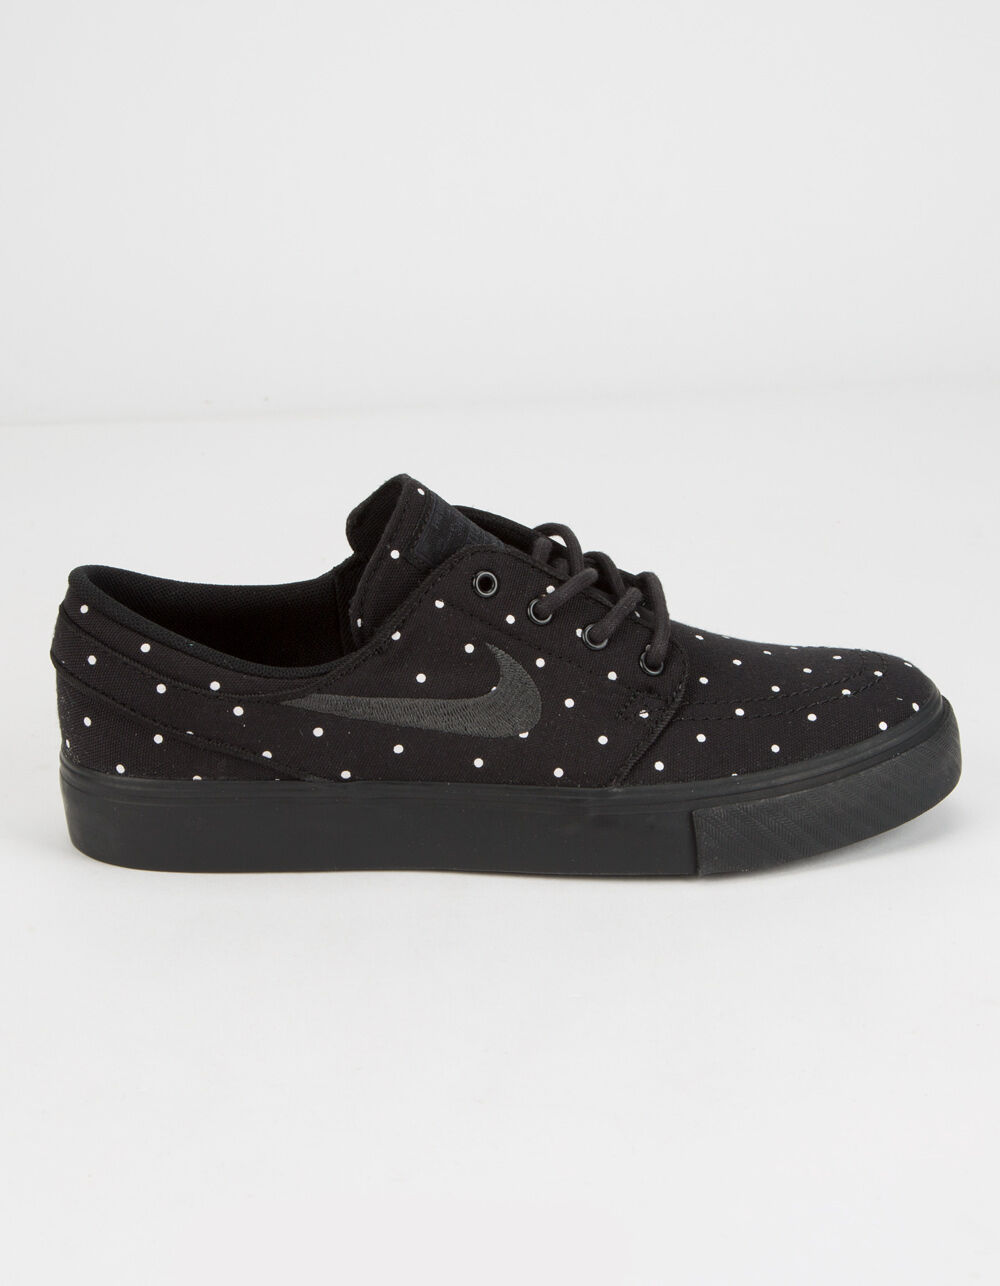 NIKE SB Stefan Janoski Print 1 Black & Anthracite White Girls Shoes